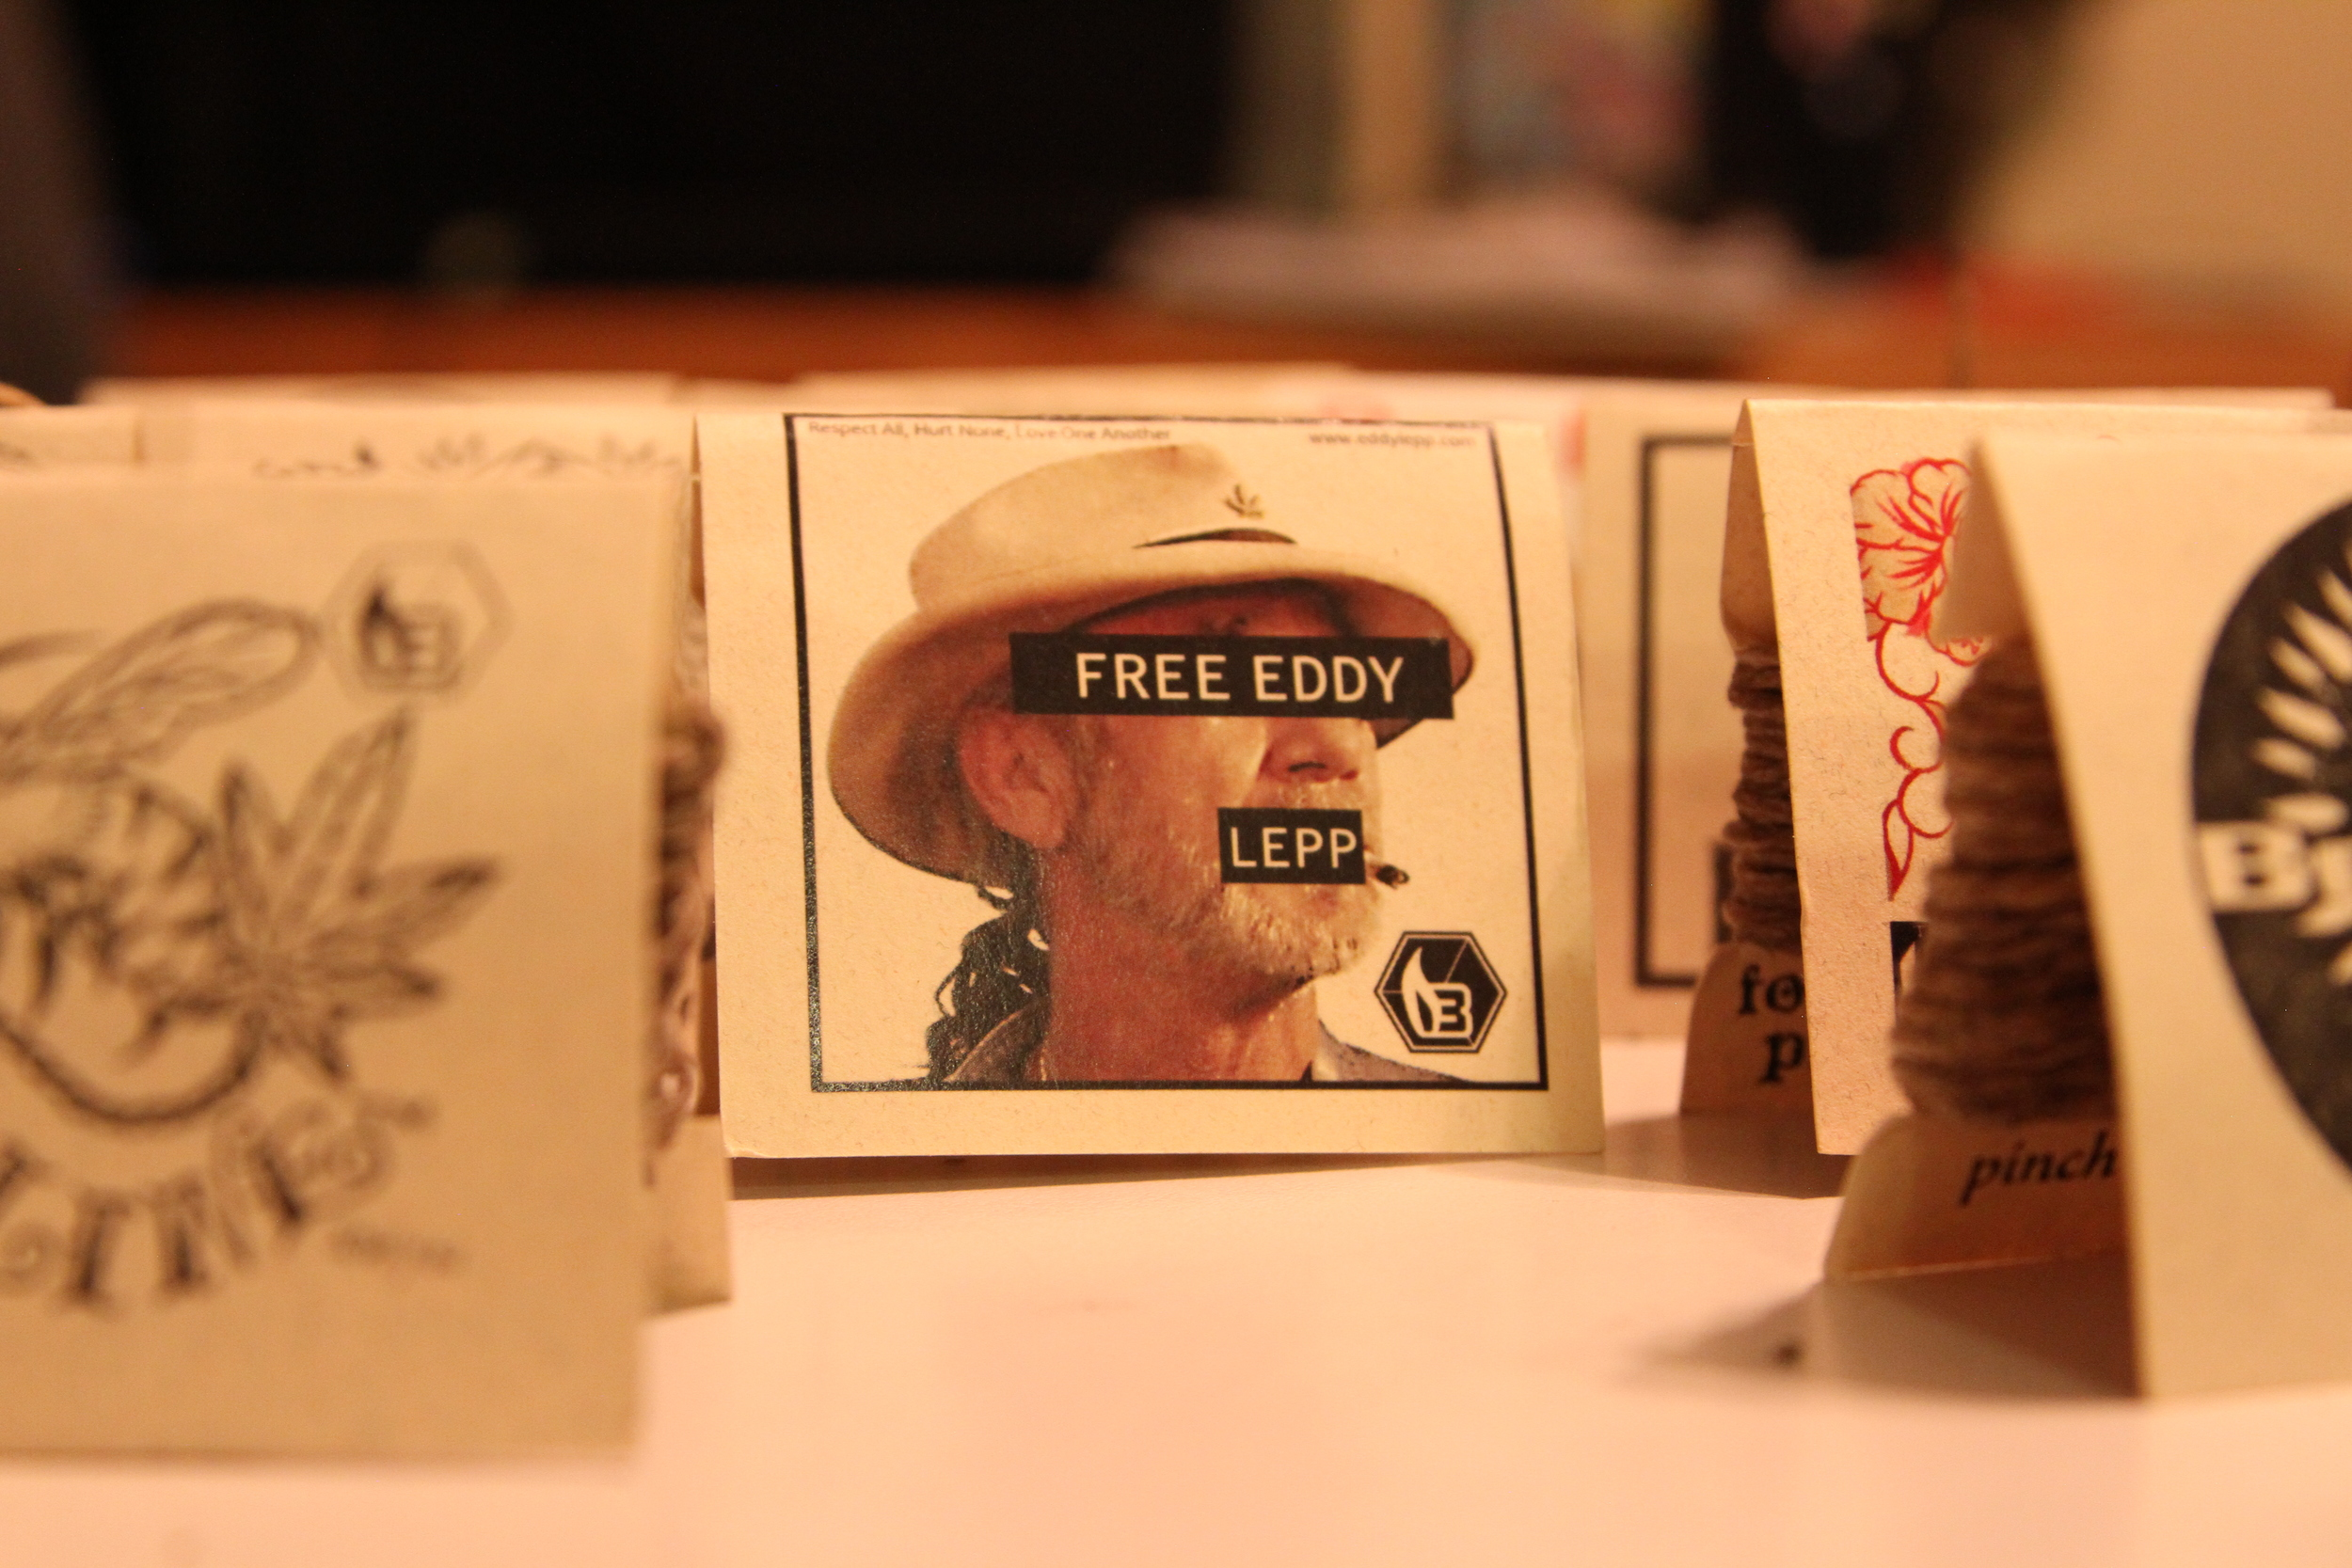 Bee Line Free Eddy Lepp Pack